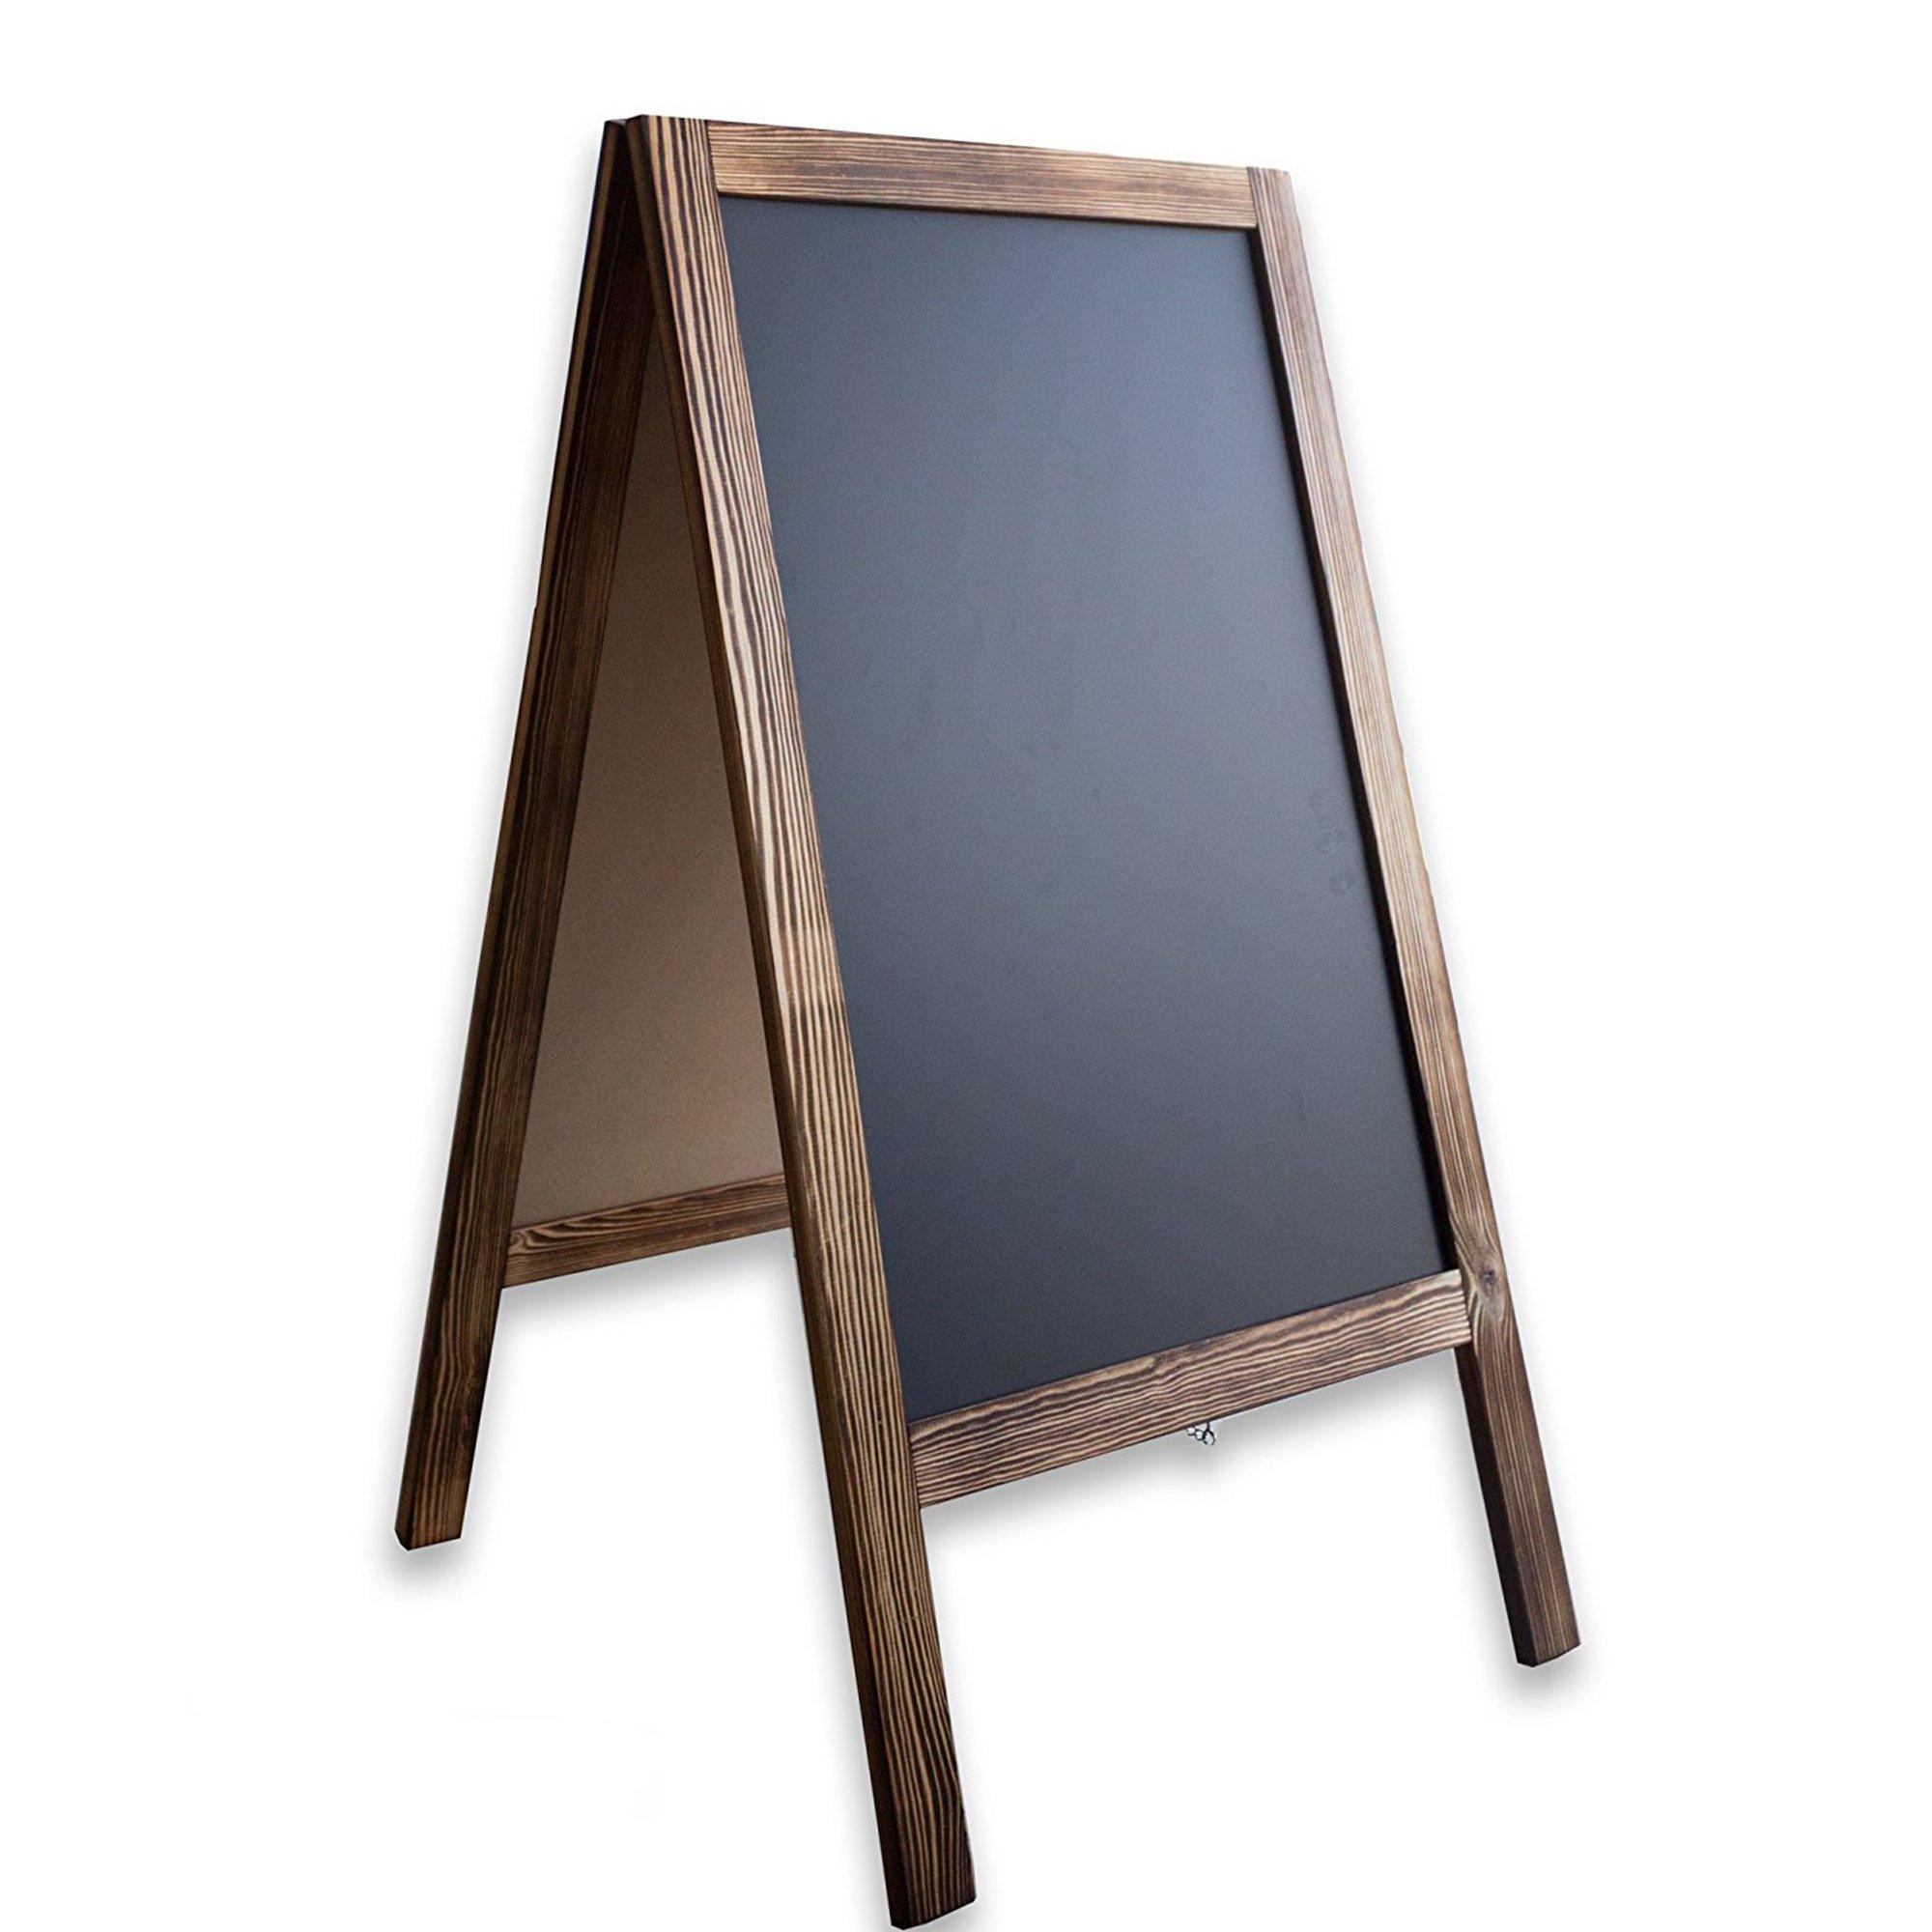 Wooden A-Frame Sign with Eraser & Chalk - 40'' x 20'' Magnetic Sidewalk Chalkboard – Sturdy Freestanding Sandwich Board Menu Display for Restaurant, Business or Wedding by Ilyapa (Image #8)